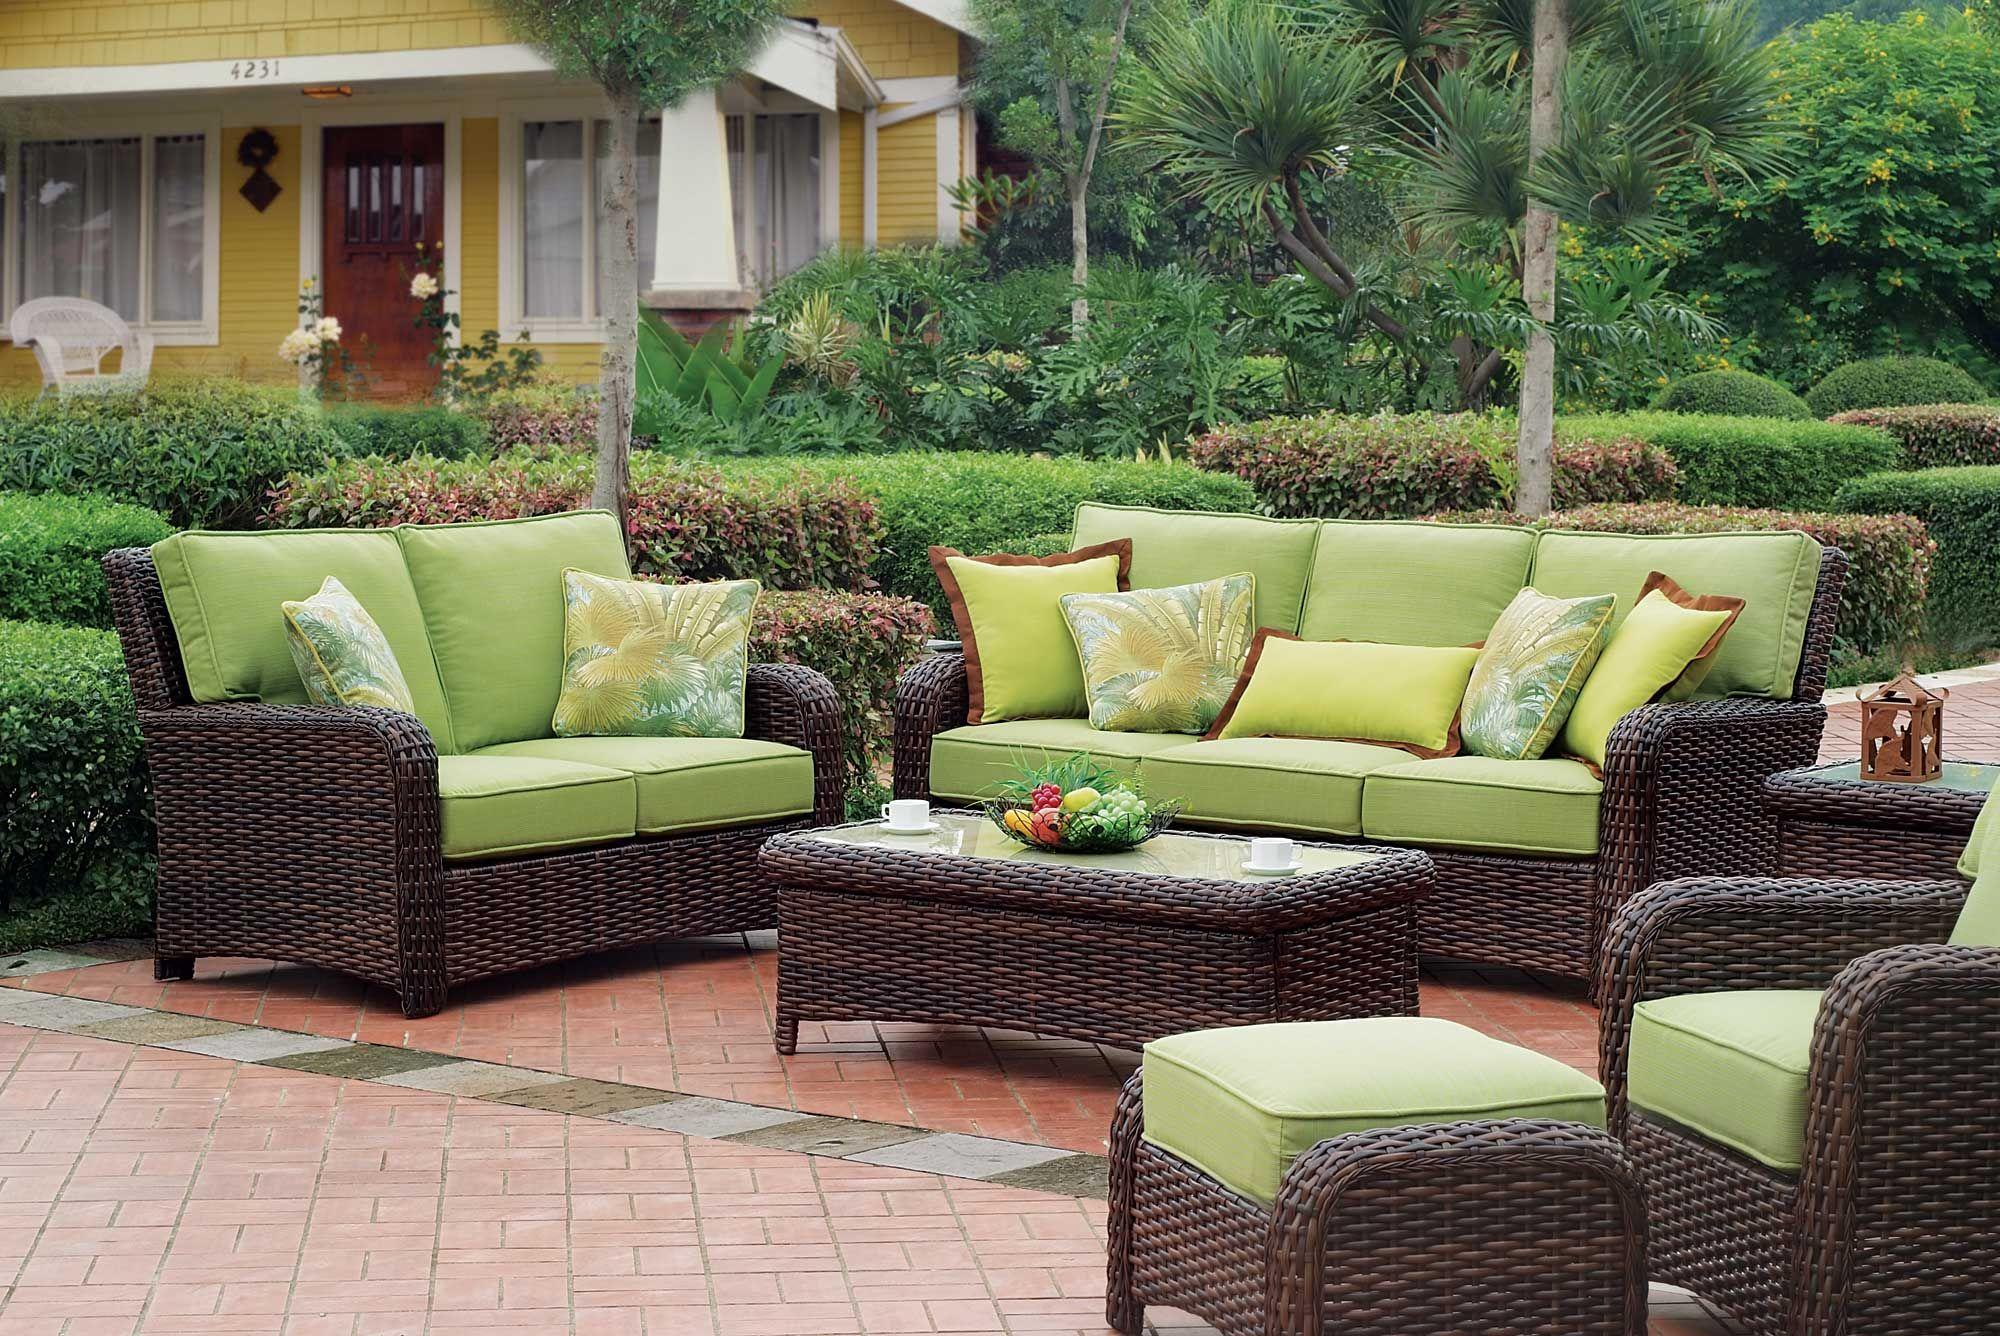 Outdoor Wicker Patio Furniture Outdoor Wicker Patio Furniture Outdoor Wicker Furniture Wicker Patio Furniture Sets